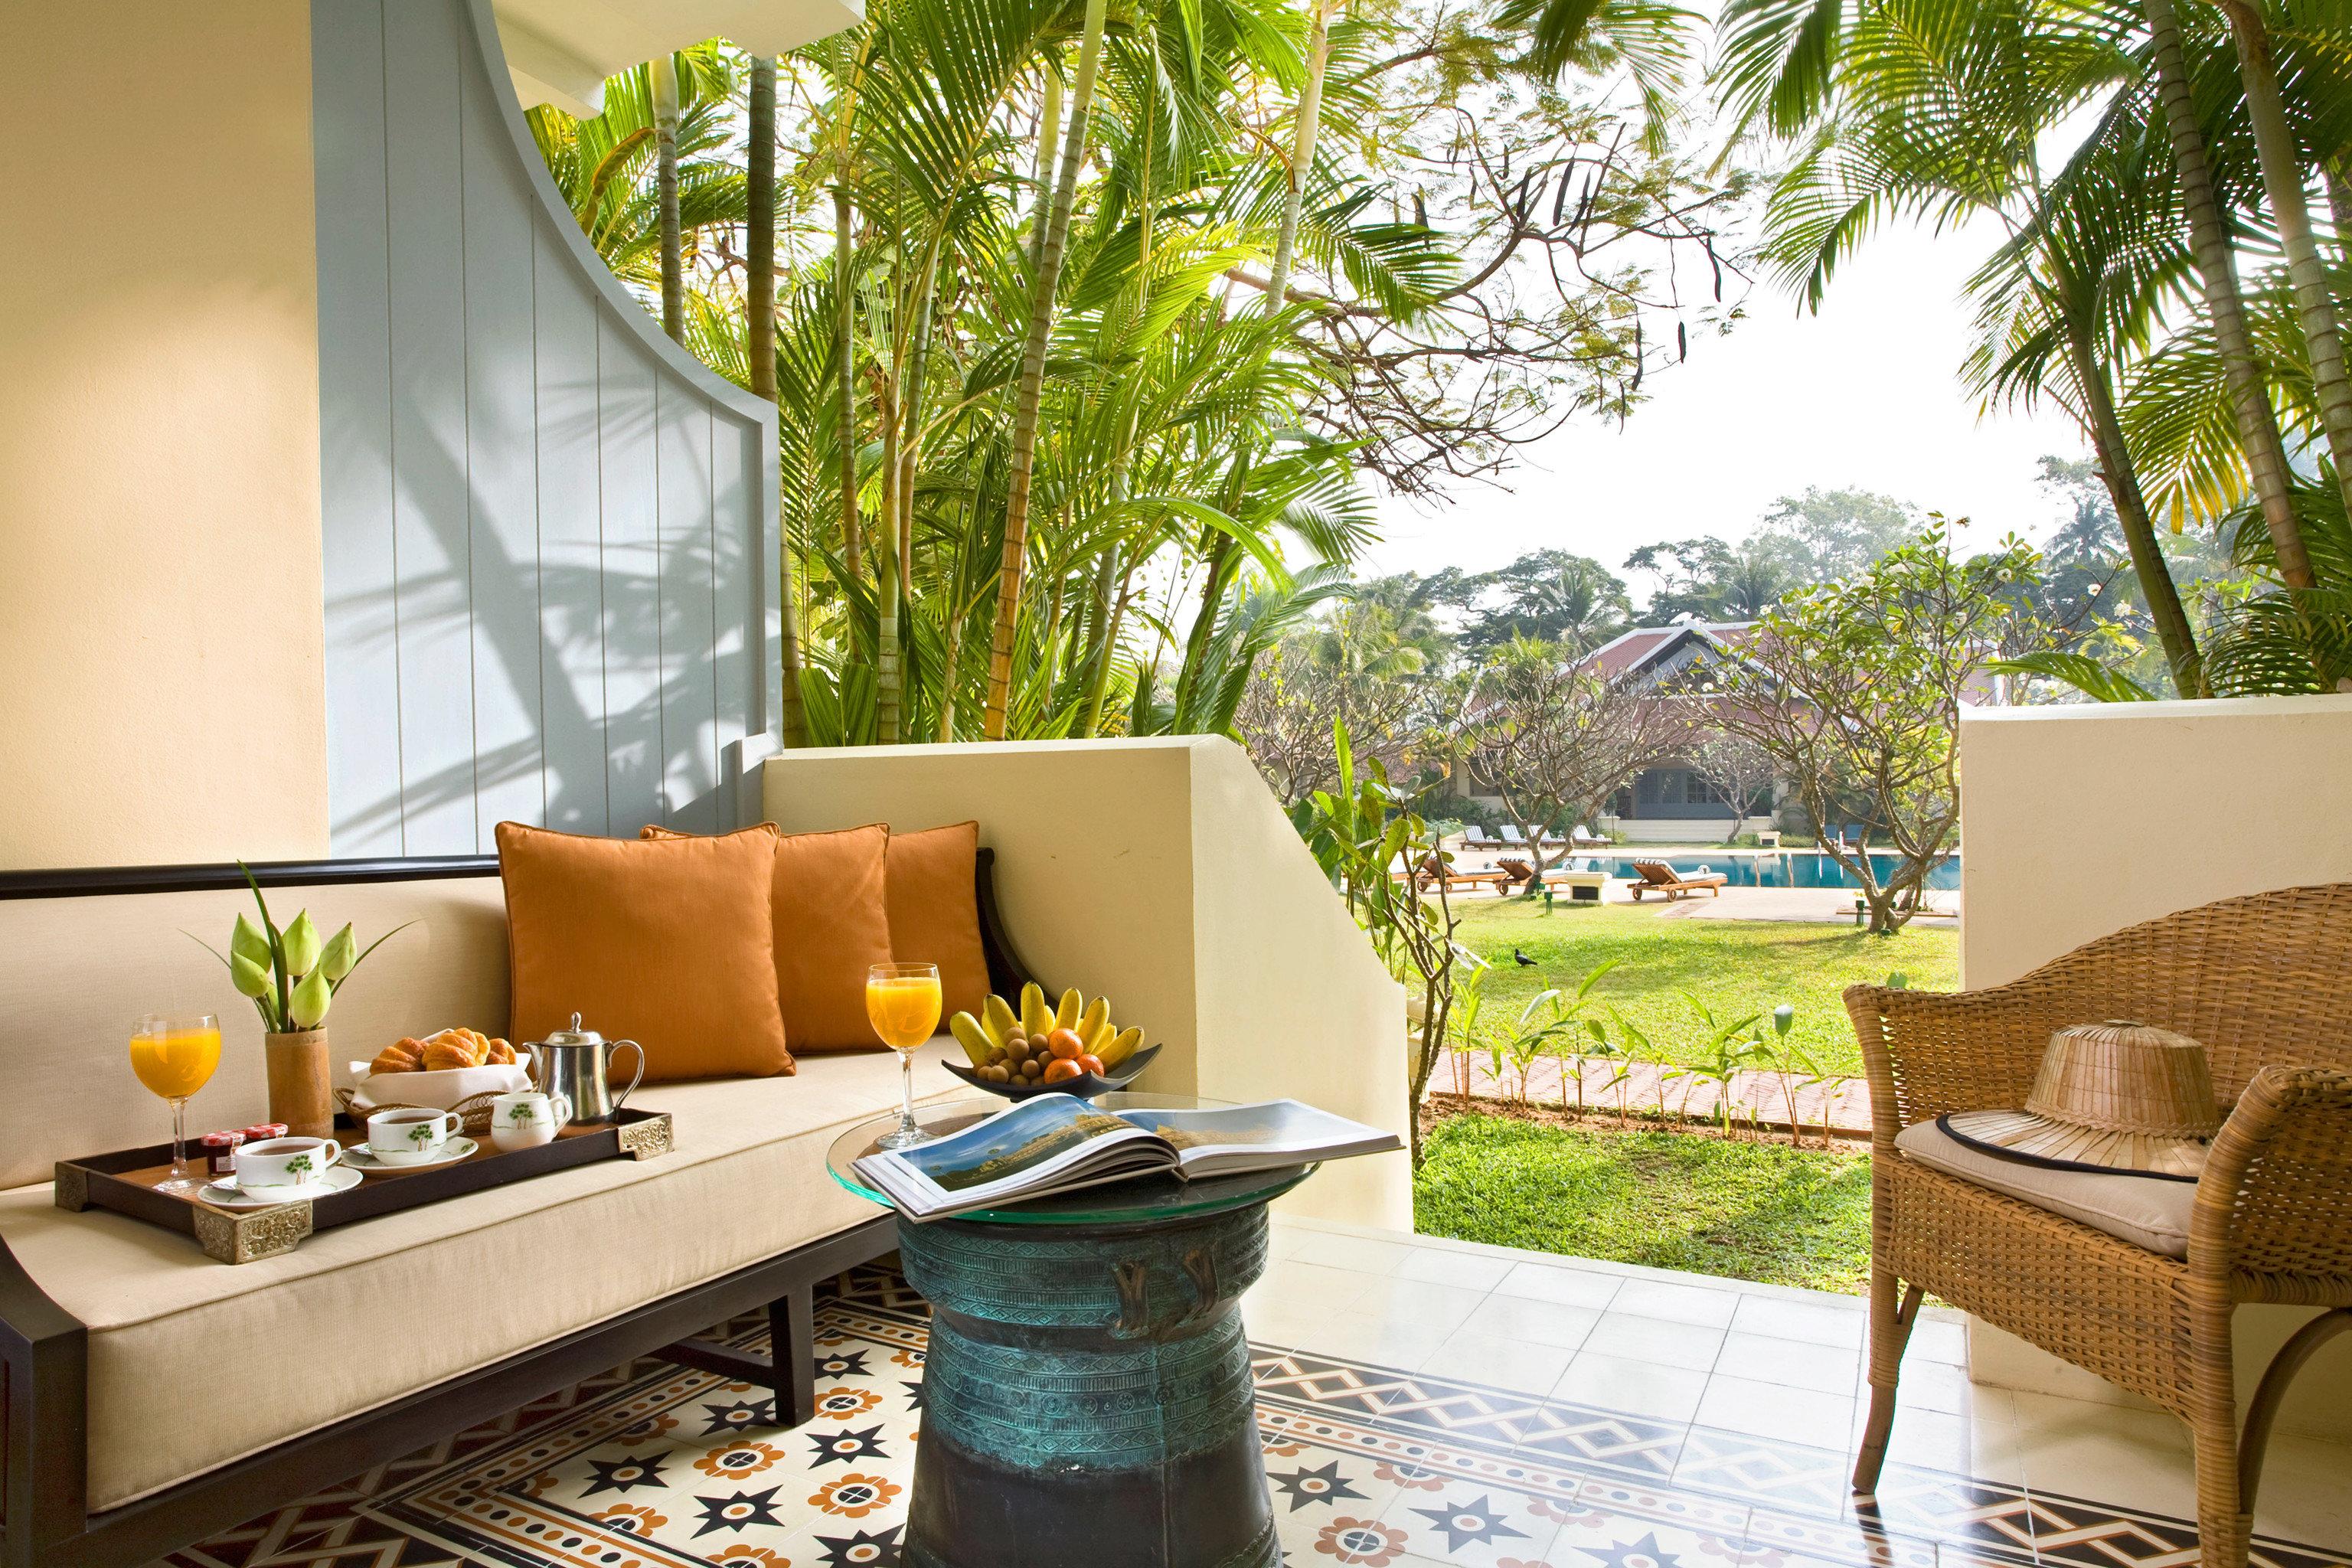 Balcony Country Historic Luxury Terrace Tropical tree property condominium home Resort Villa living room backyard cottage swimming pool